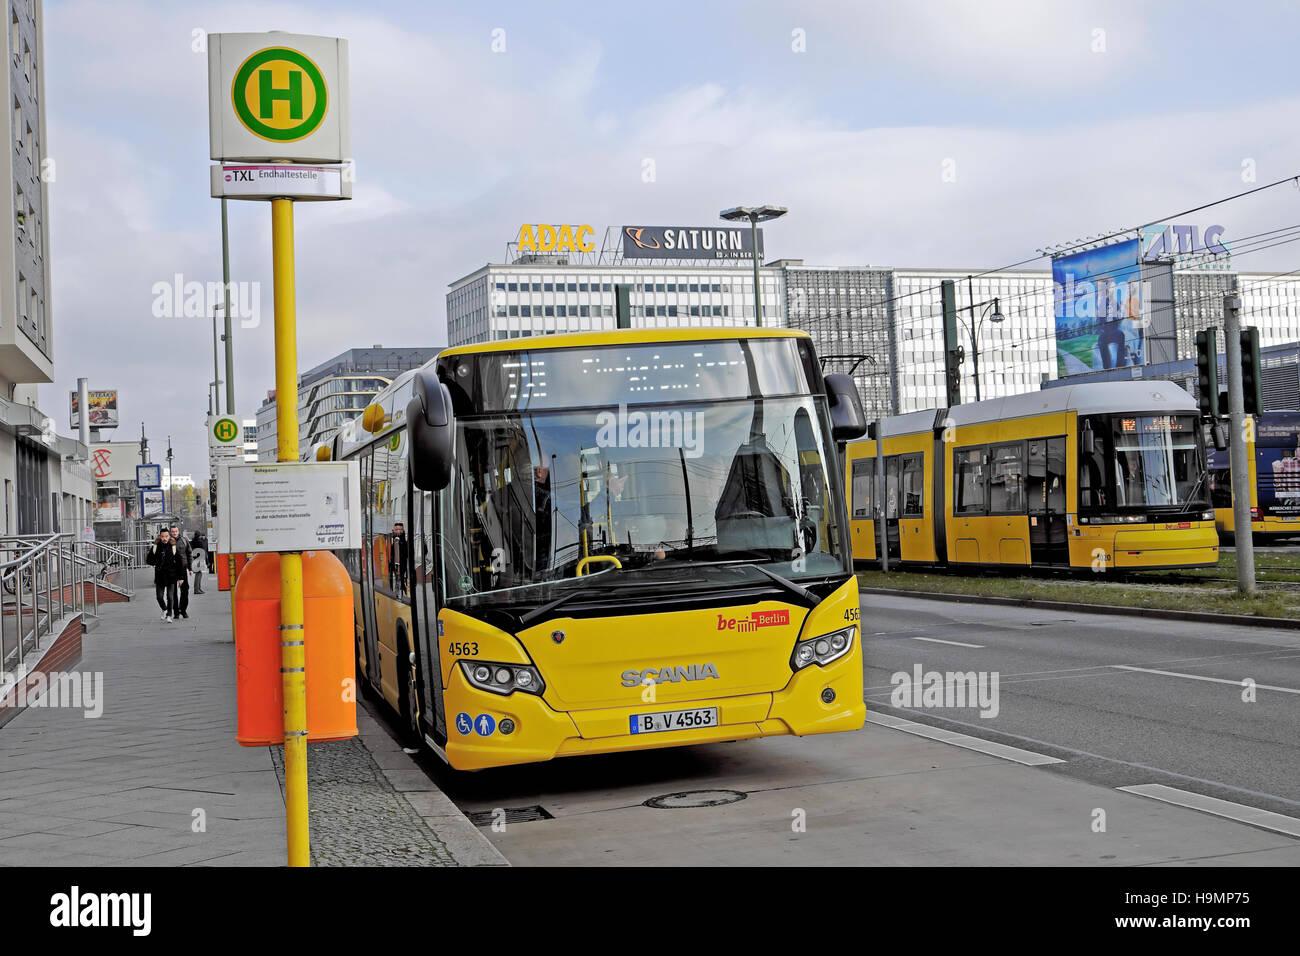 tegel flughafen bus txl bus haltestelle alexanderplatz in berlin november 2016 deutschland. Black Bedroom Furniture Sets. Home Design Ideas